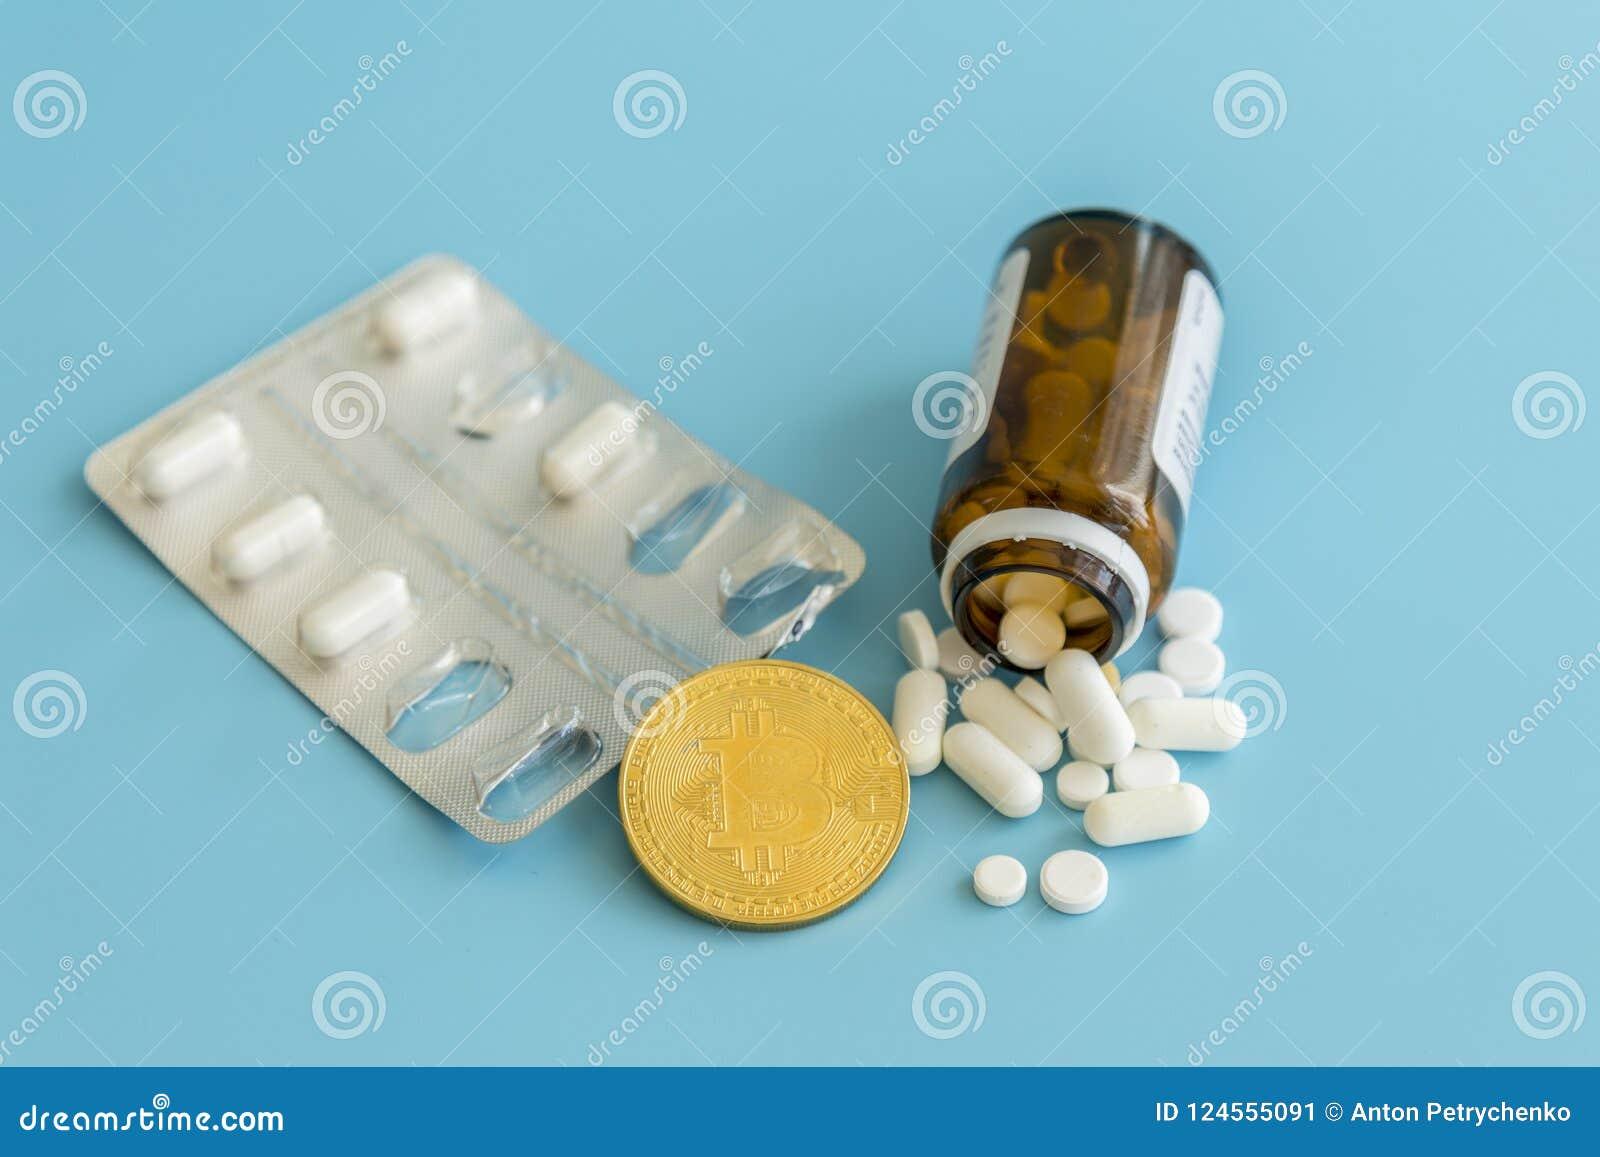 btc medicina